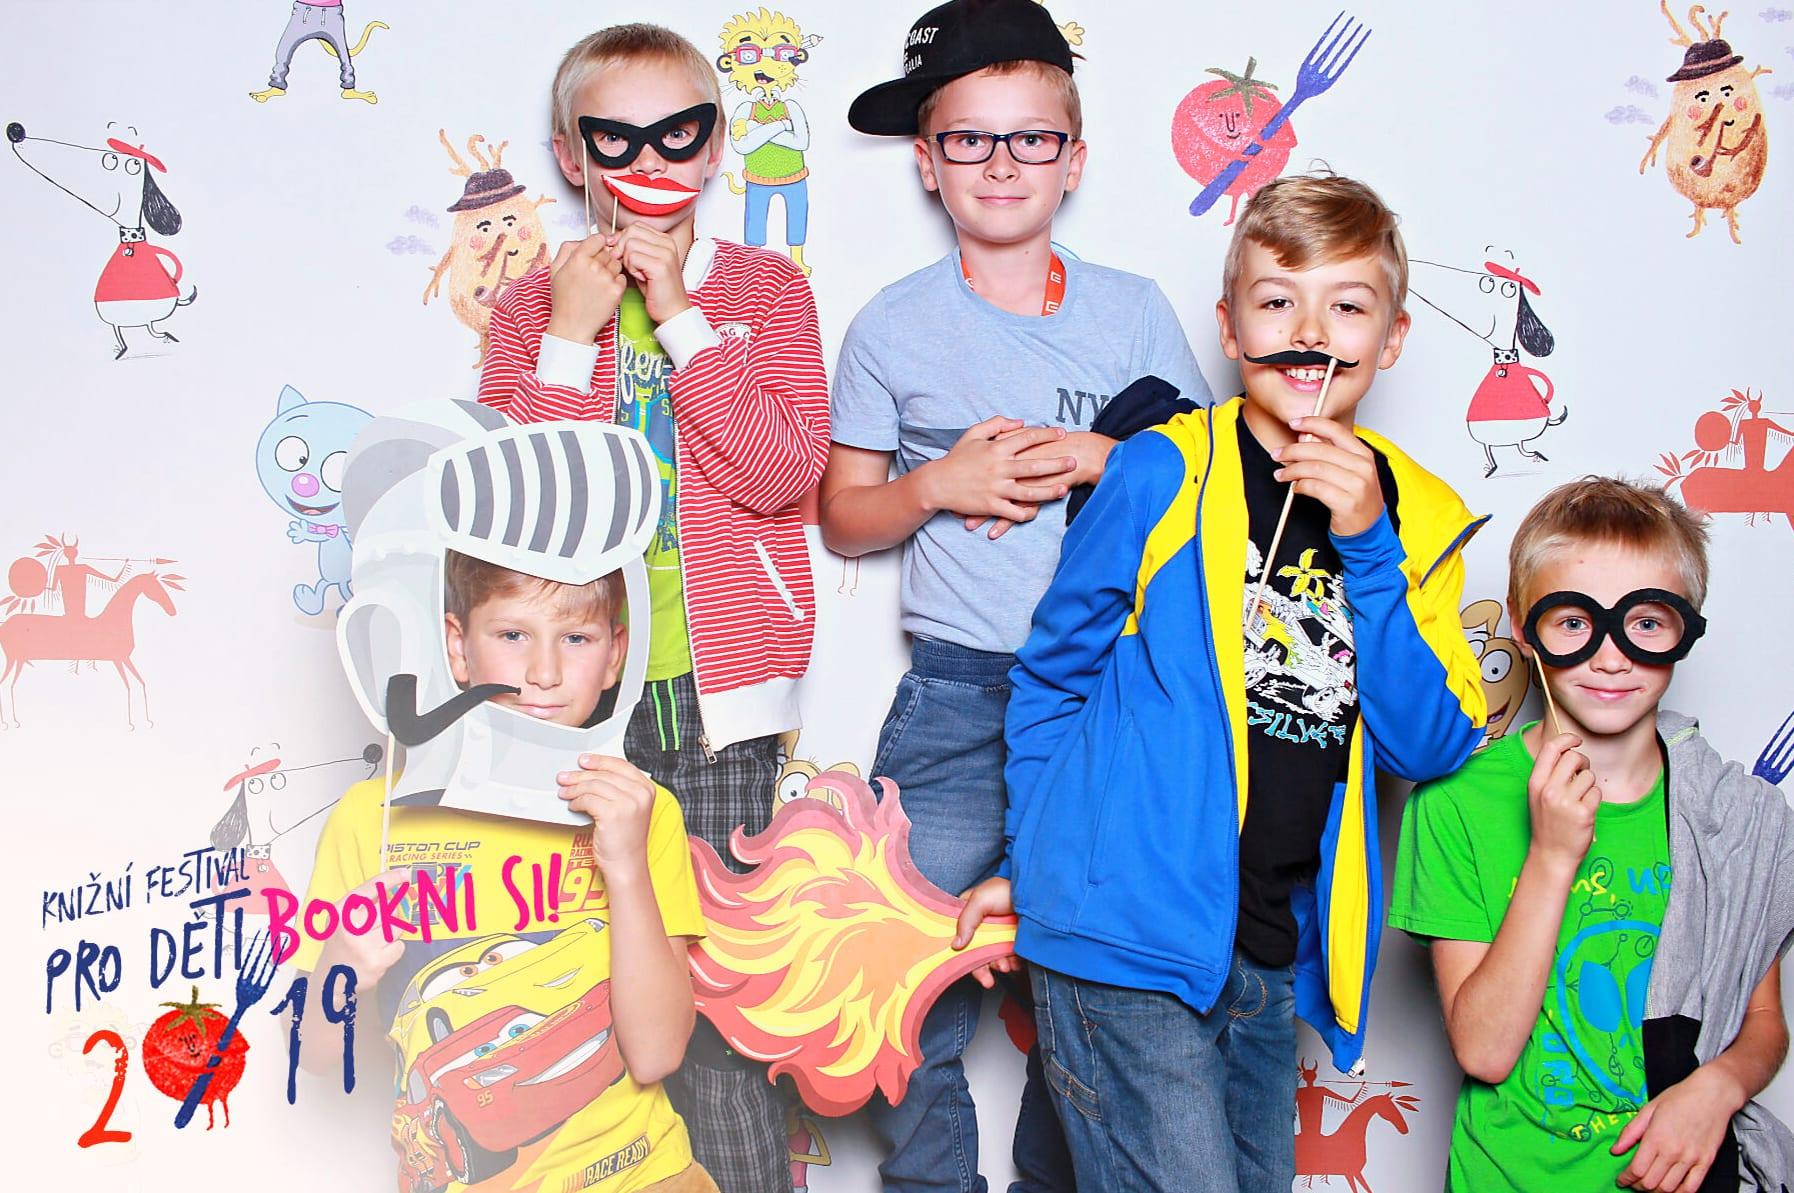 fotokoutek-festival-praha-bookni-si-18-9-2019-653263